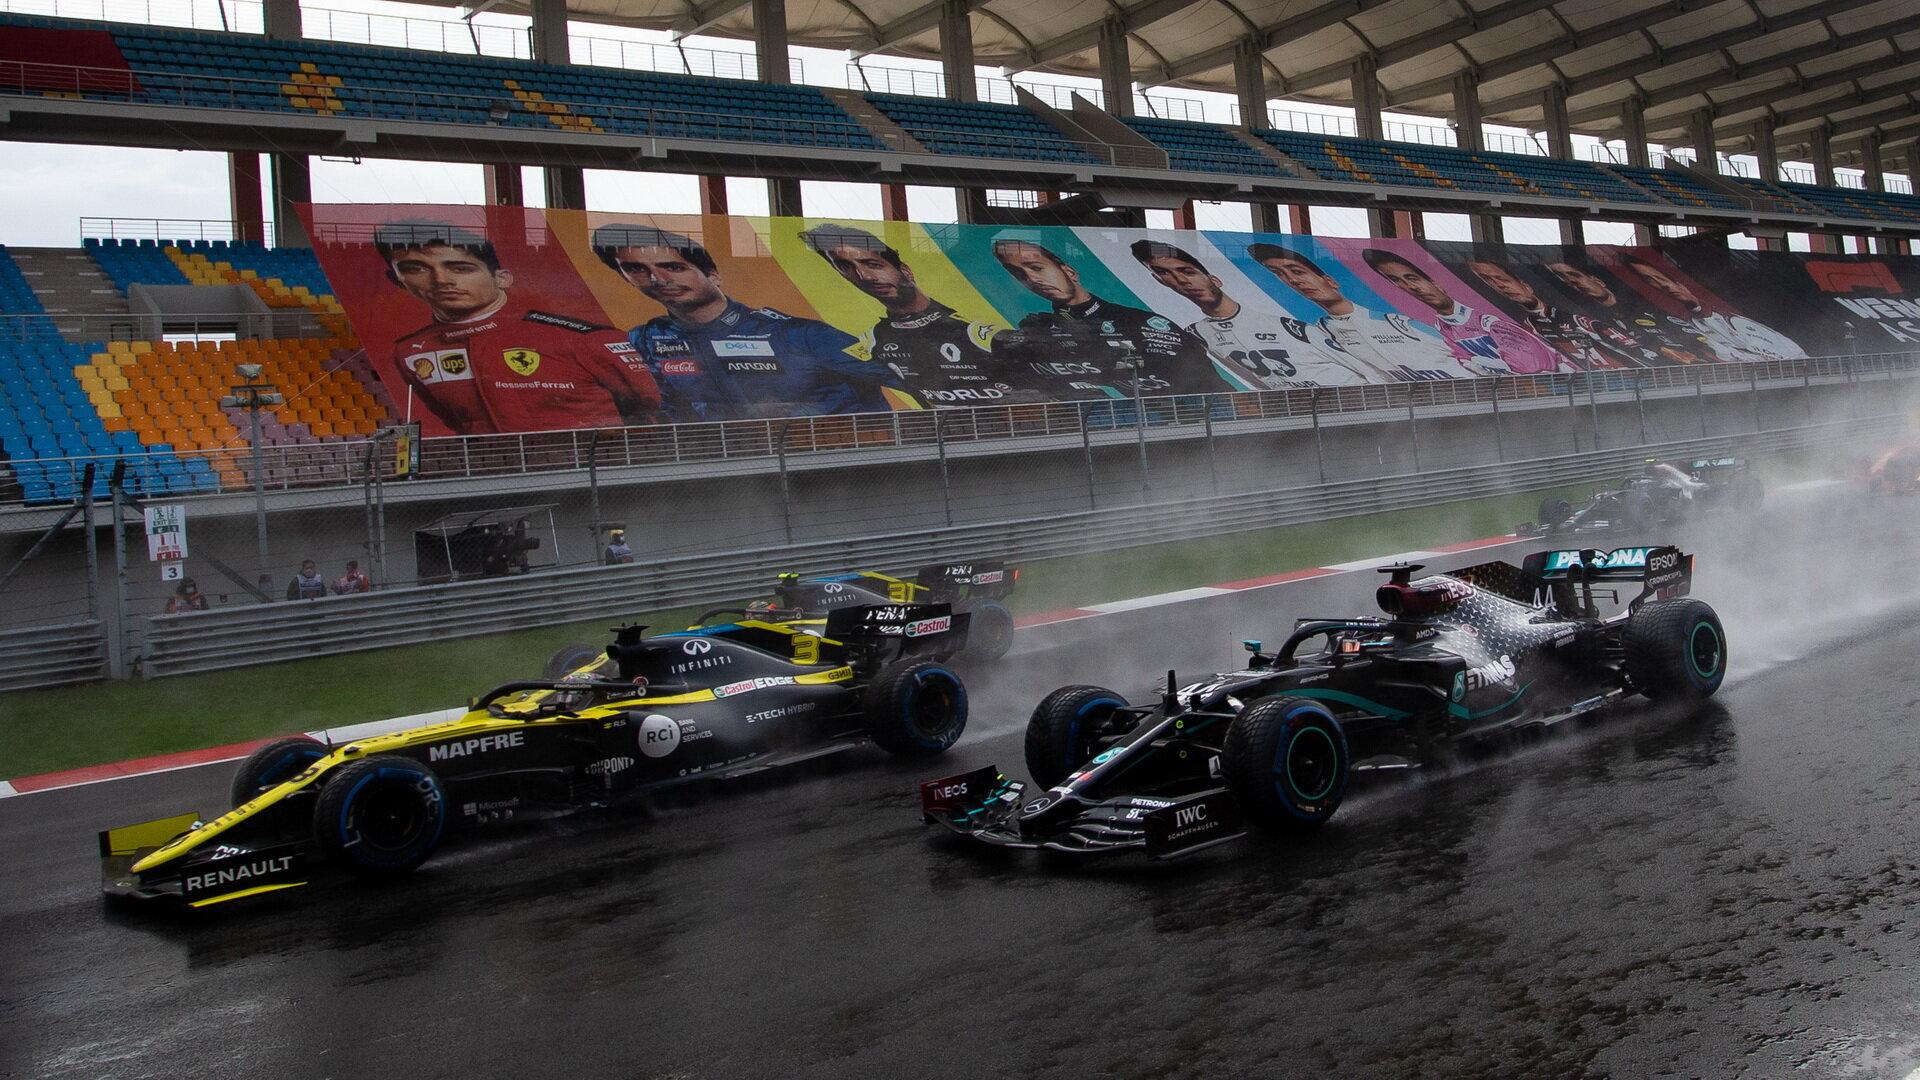 Daniel Ricciardo a Lewis Hamilton při startu závodu v Turecku